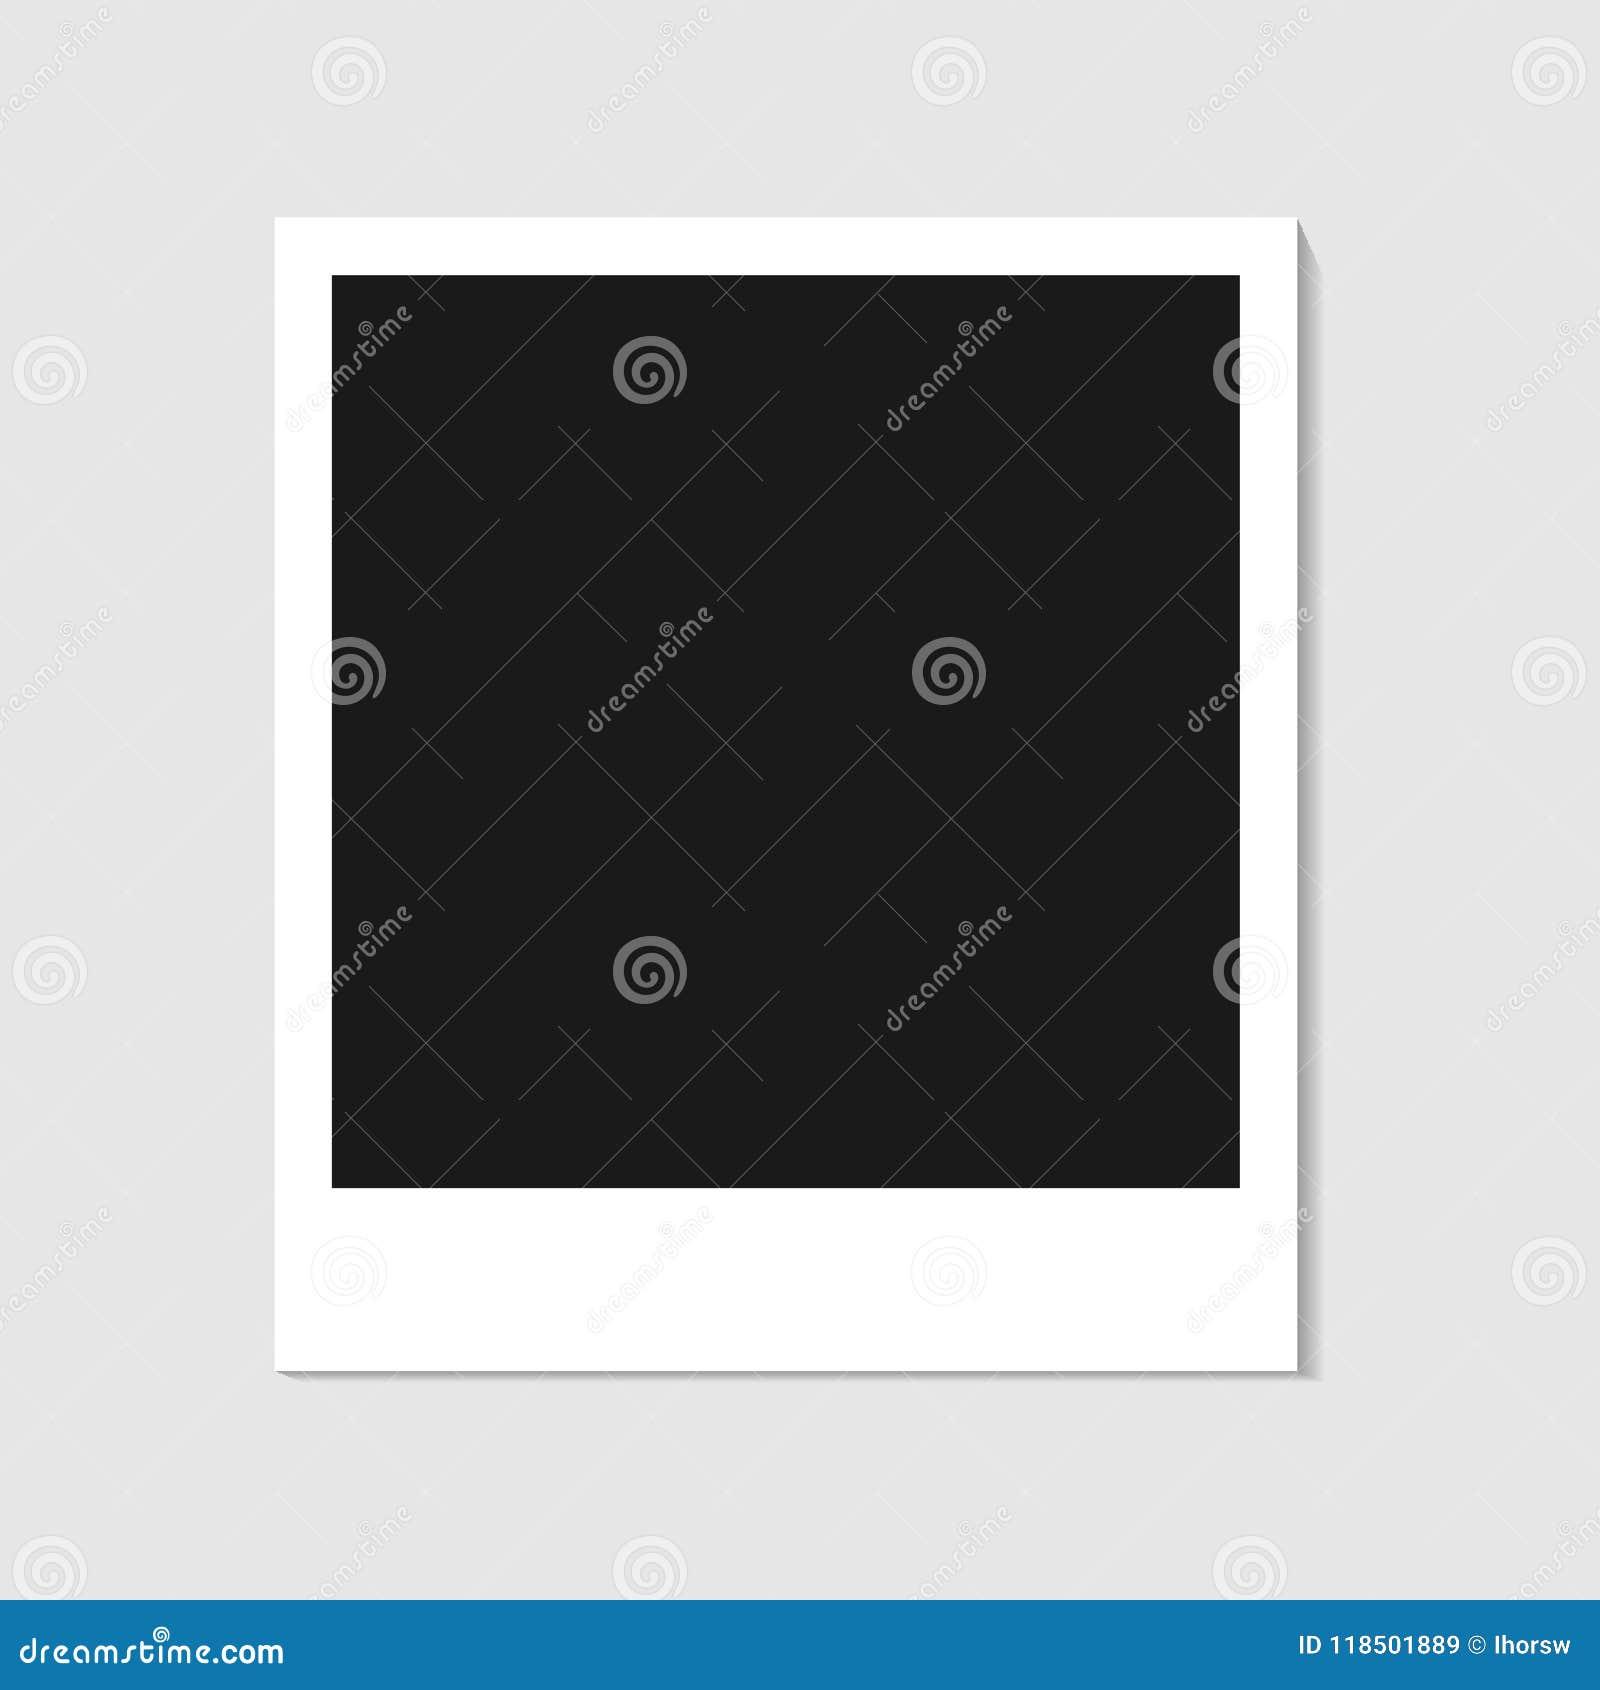 Blank Photo Polaroid Frame Isolated On White Background Shadow